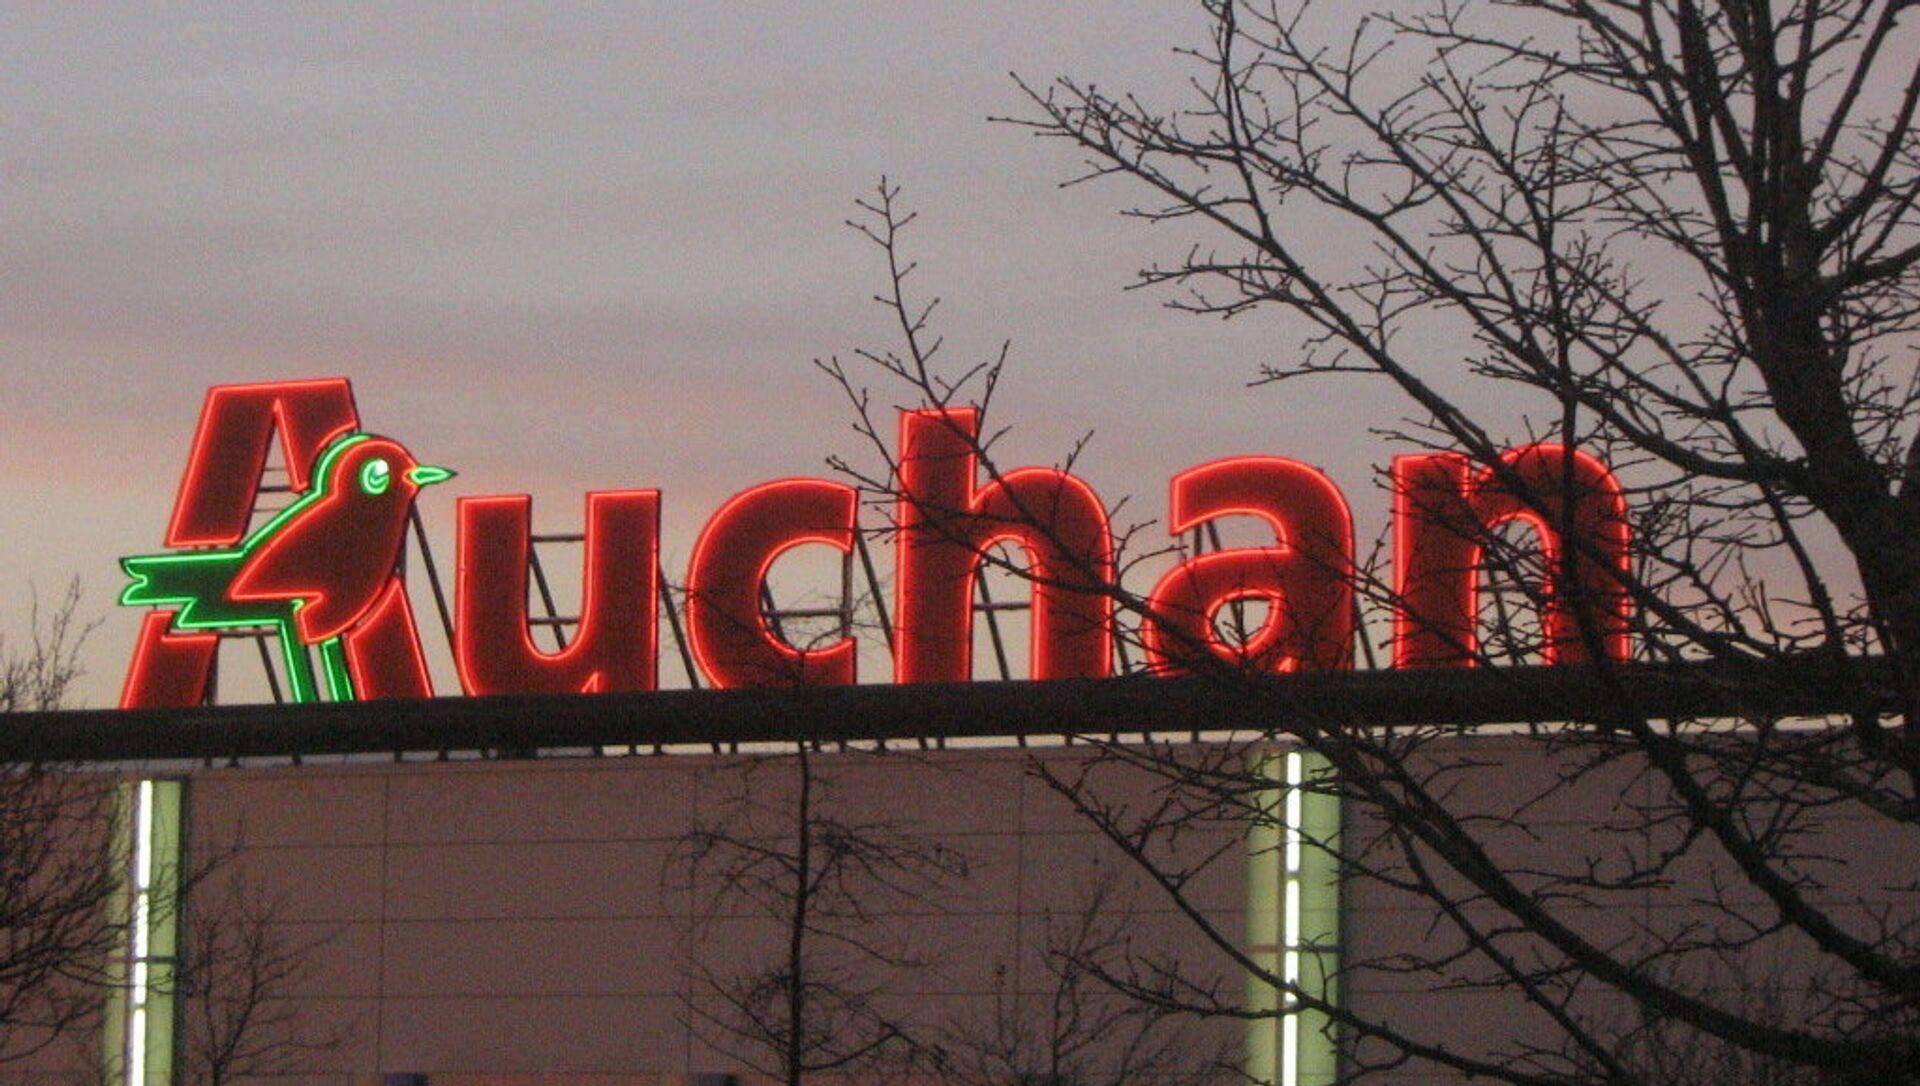 Auchan - Sputnik France, 1920, 27.08.2021